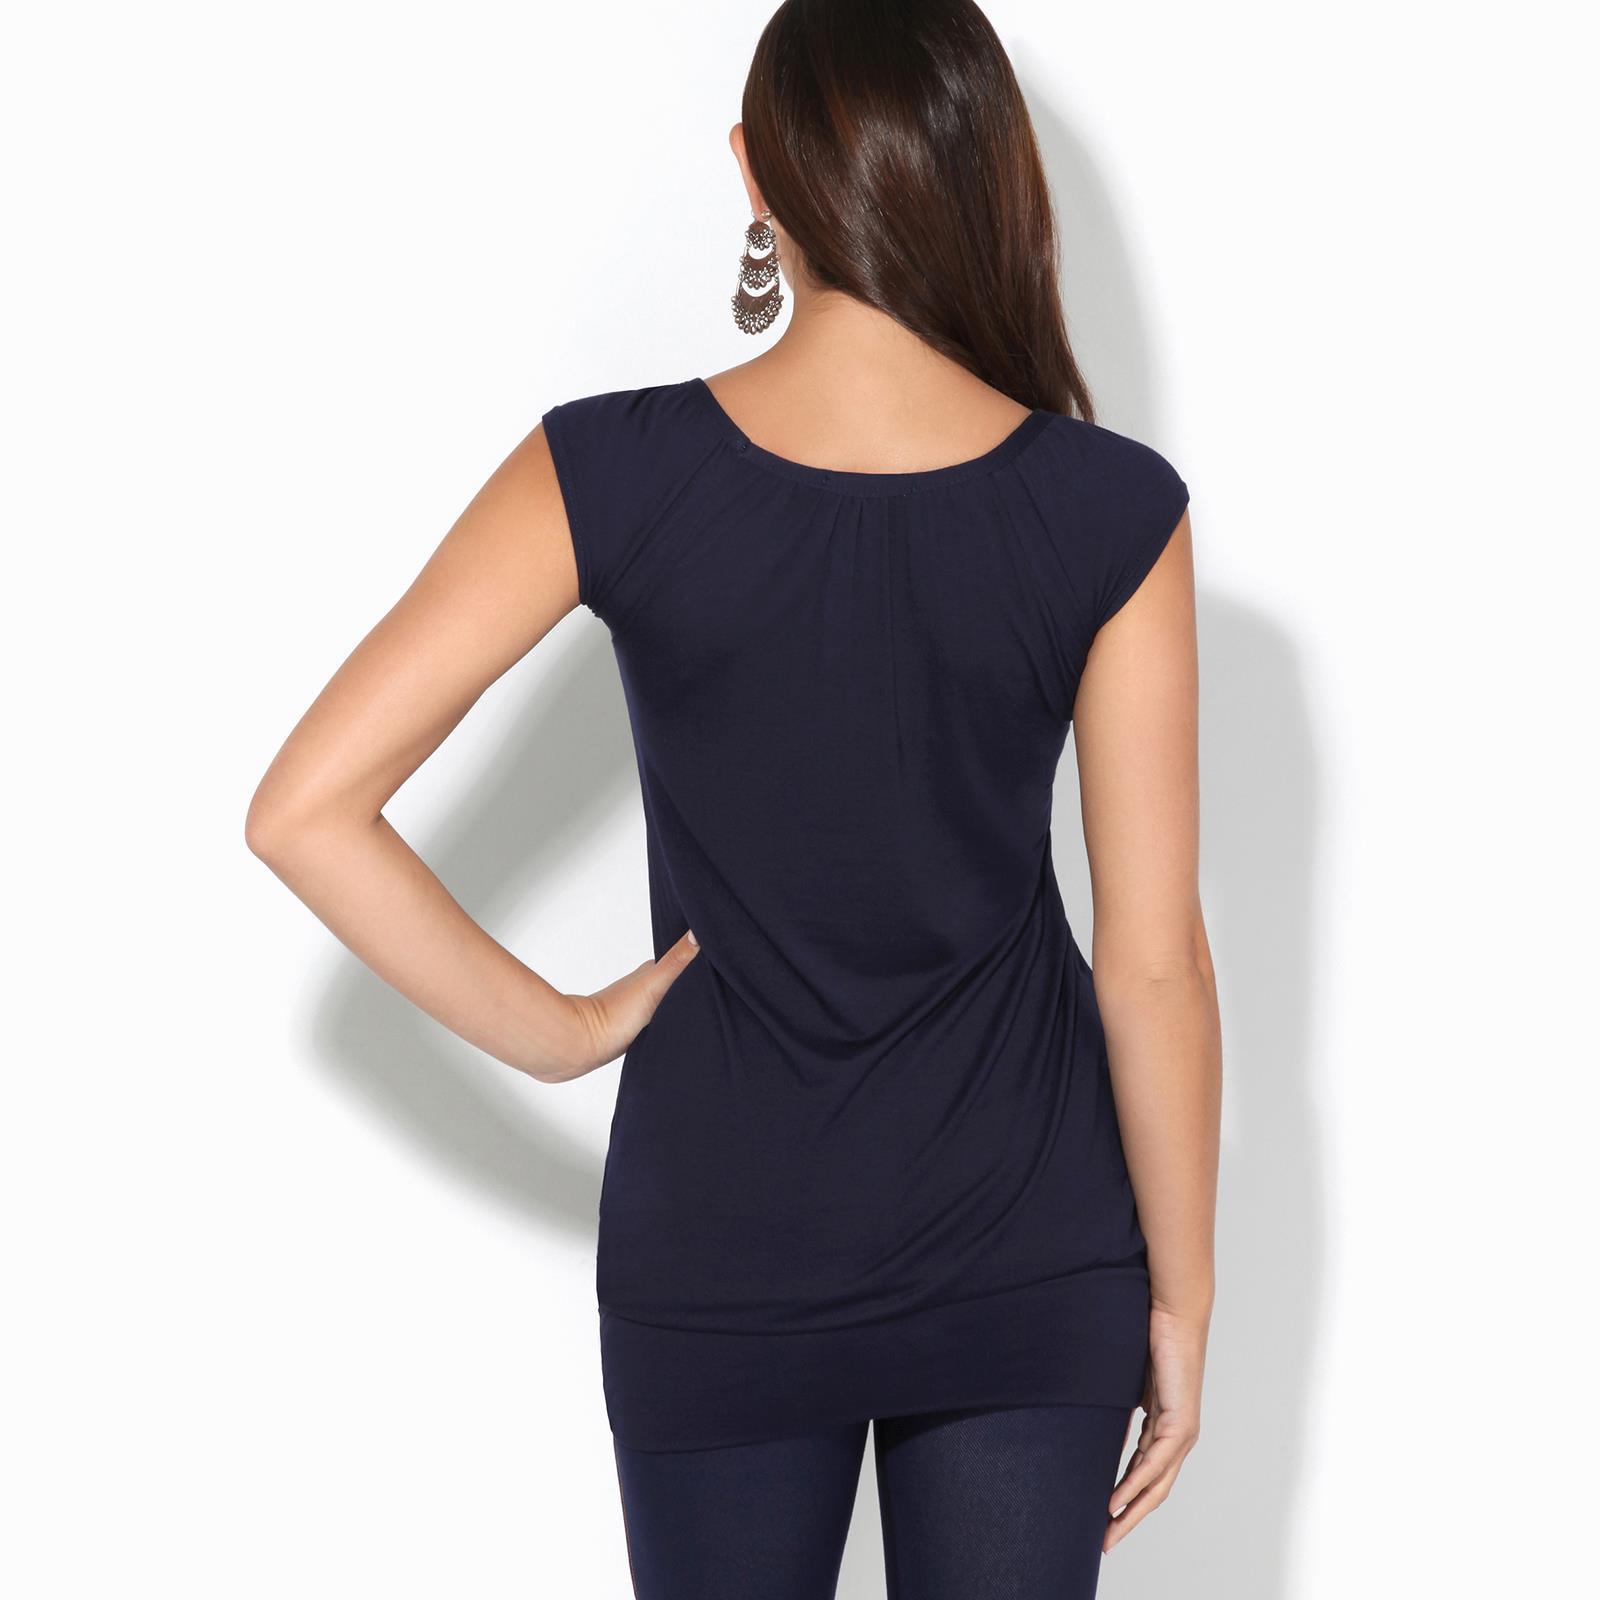 Womens-Ladies-Scoop-Neck-Blouse-V-T-Shirt-Long-Short-Sleeve-Plain-Loose-Top thumbnail 32